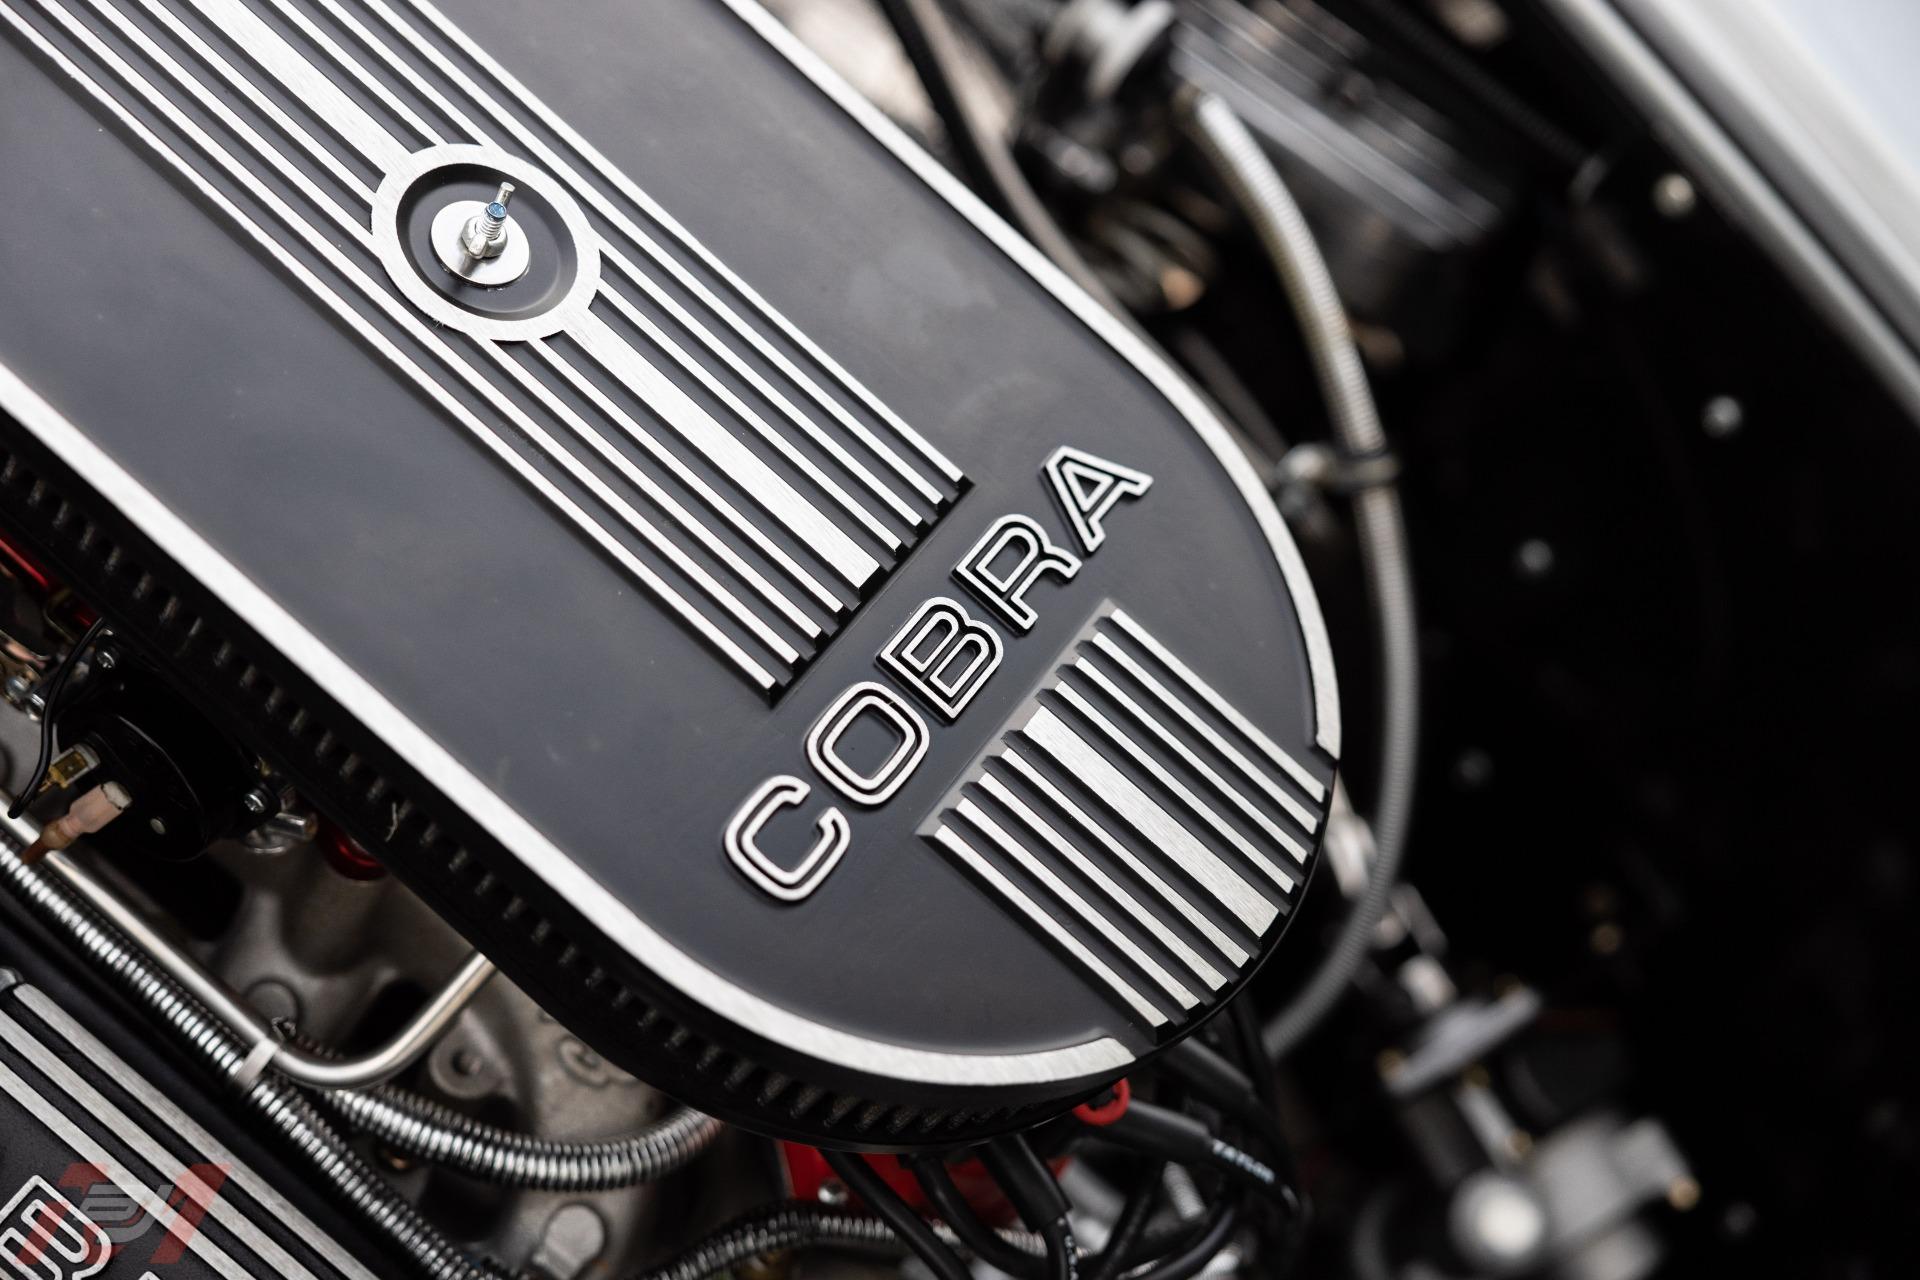 Used-1965-Shelby-Cobra-Mark-III-Factory-Five-Racing